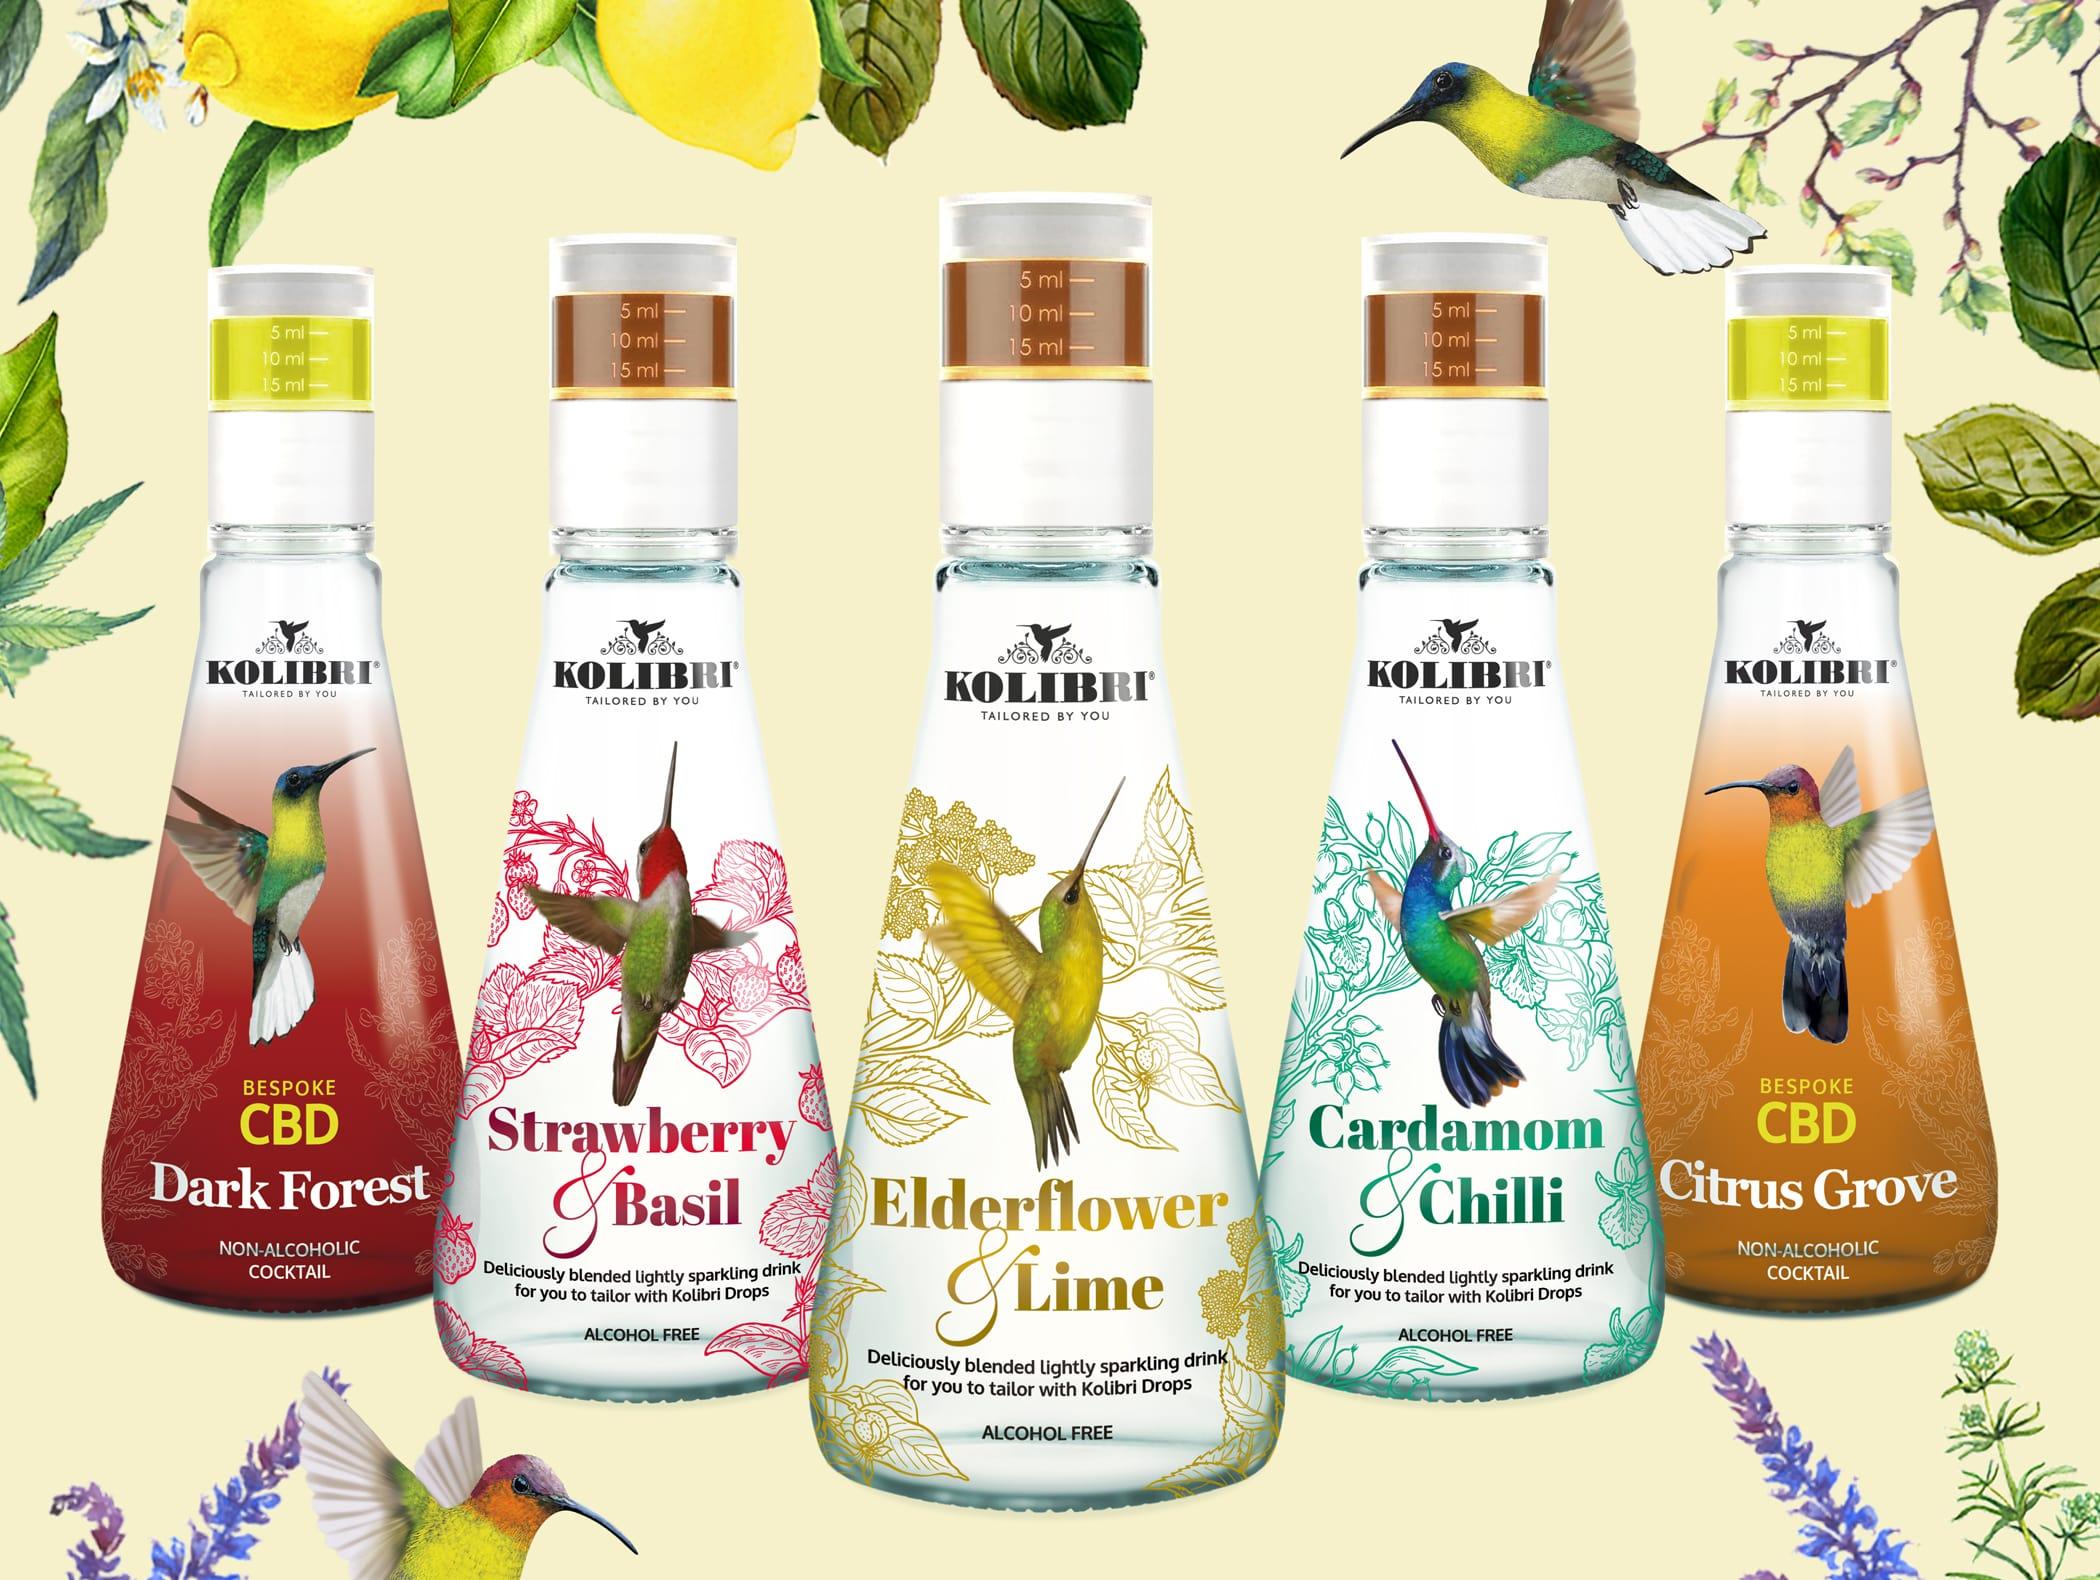 Kolibri CBD Drinks-Large-banner-2100px-by-1580px-min